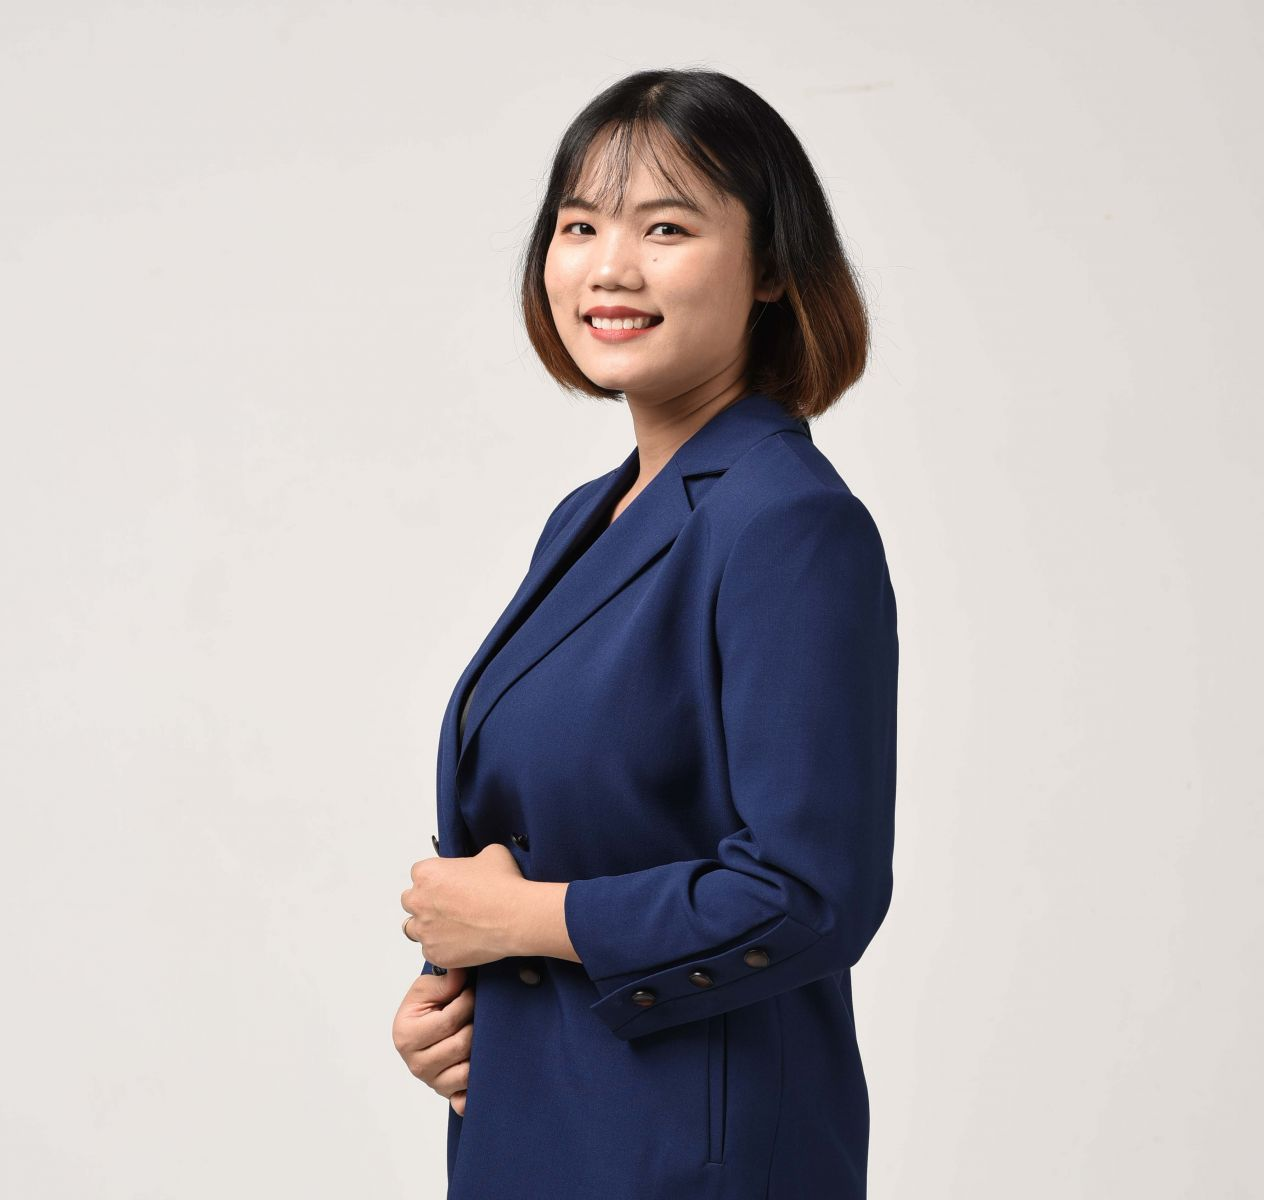 Giang Kawa